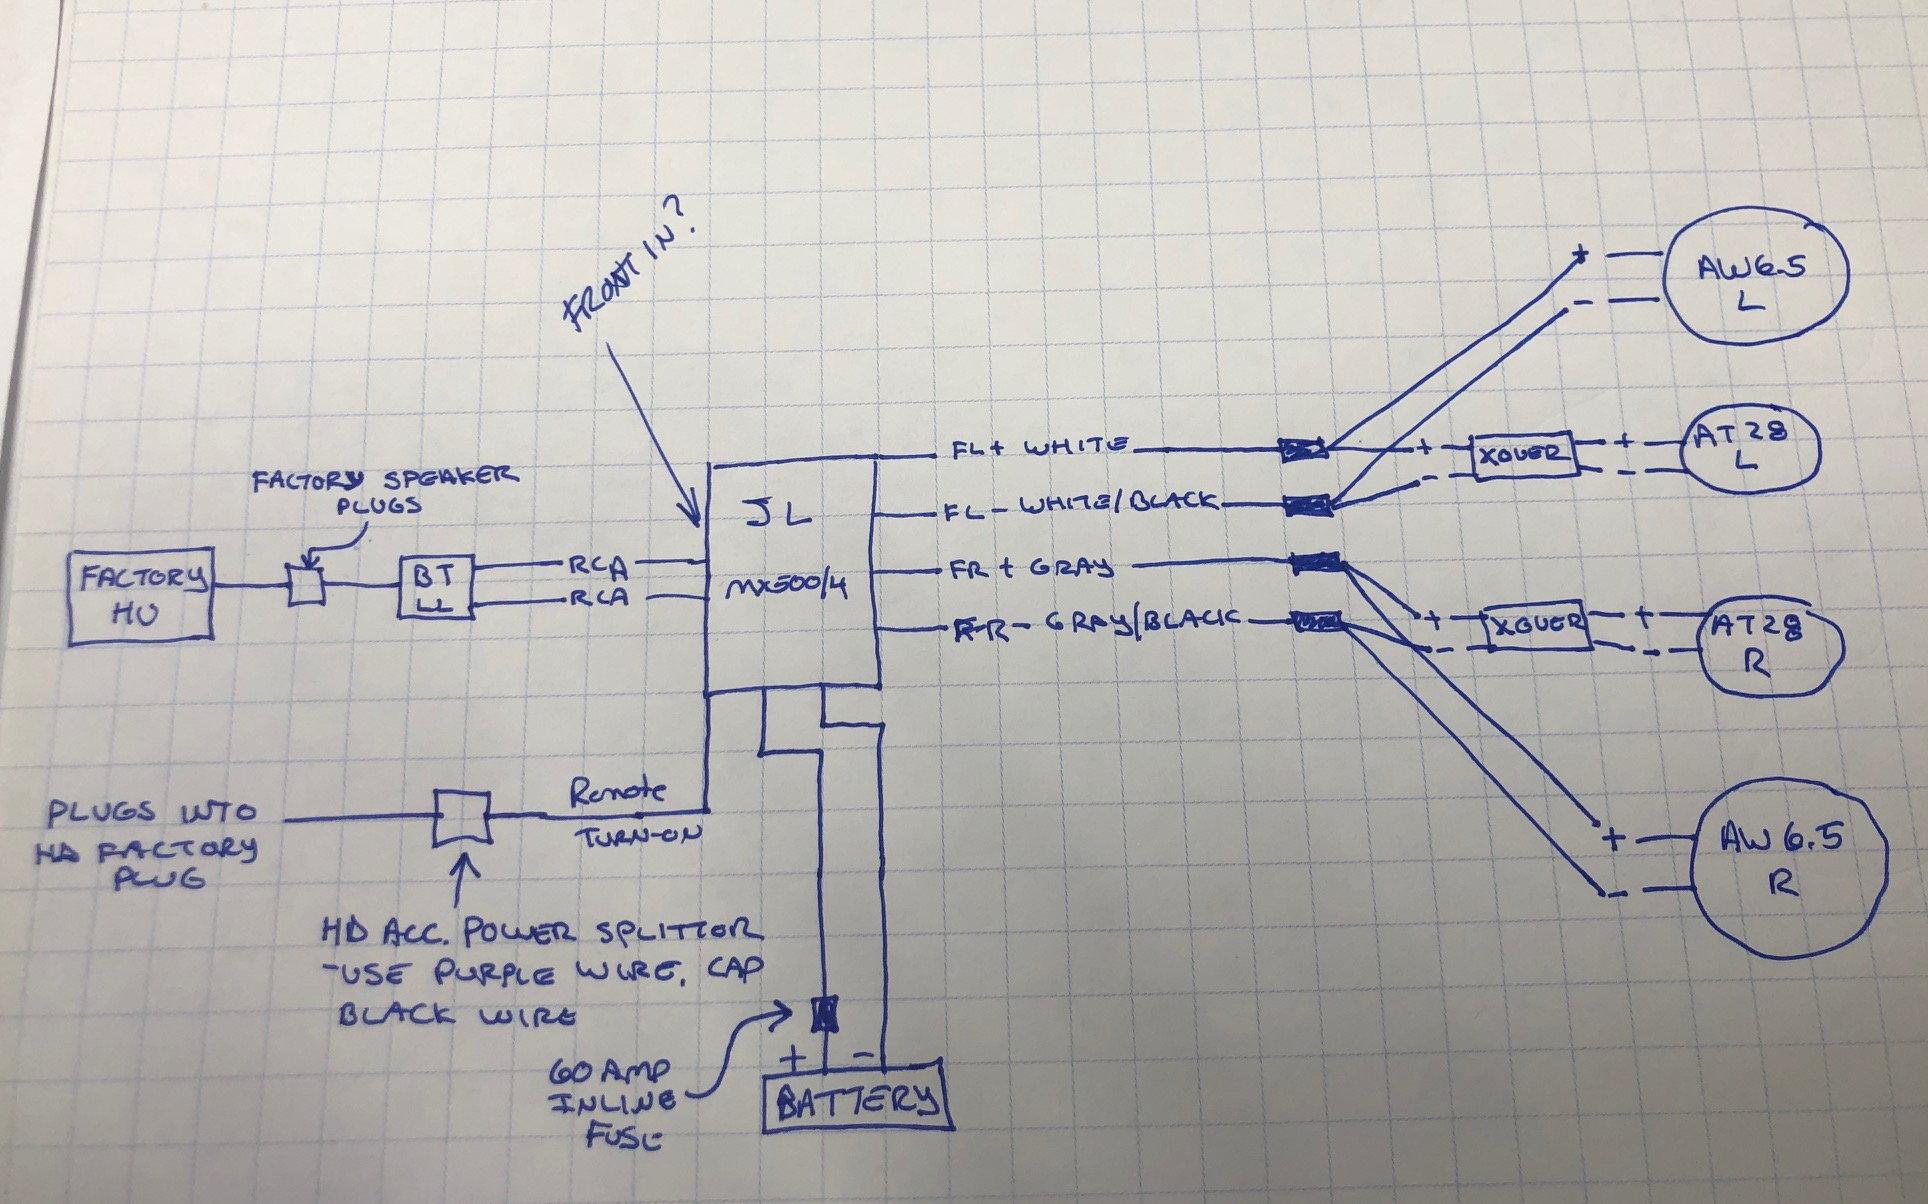 img_7416_c3fddf88991451e51ab37bea71a3f00a465247cc Jl Audio Speaker Wiring Diagram on apple wiring diagram, visonik wiring diagram, clifford wiring diagram, lanzar wiring diagram, onstar fmv wiring diagram, jl 500 1 diagram, car stereo system wiring diagram, panasonic wiring diagram, planet audio wiring diagram, pioneer deh 150mp instalation diagram, jl w7 wiring diagram, chevy blazer overhead console wiring diagram, toshiba wiring diagram, polk audio wiring diagram, aiwa wiring diagram, audio control wiring diagram, definitive technology wiring diagram, dual voice coil wiring diagram, cerwin vega wiring diagram, kenwood wiring diagram,